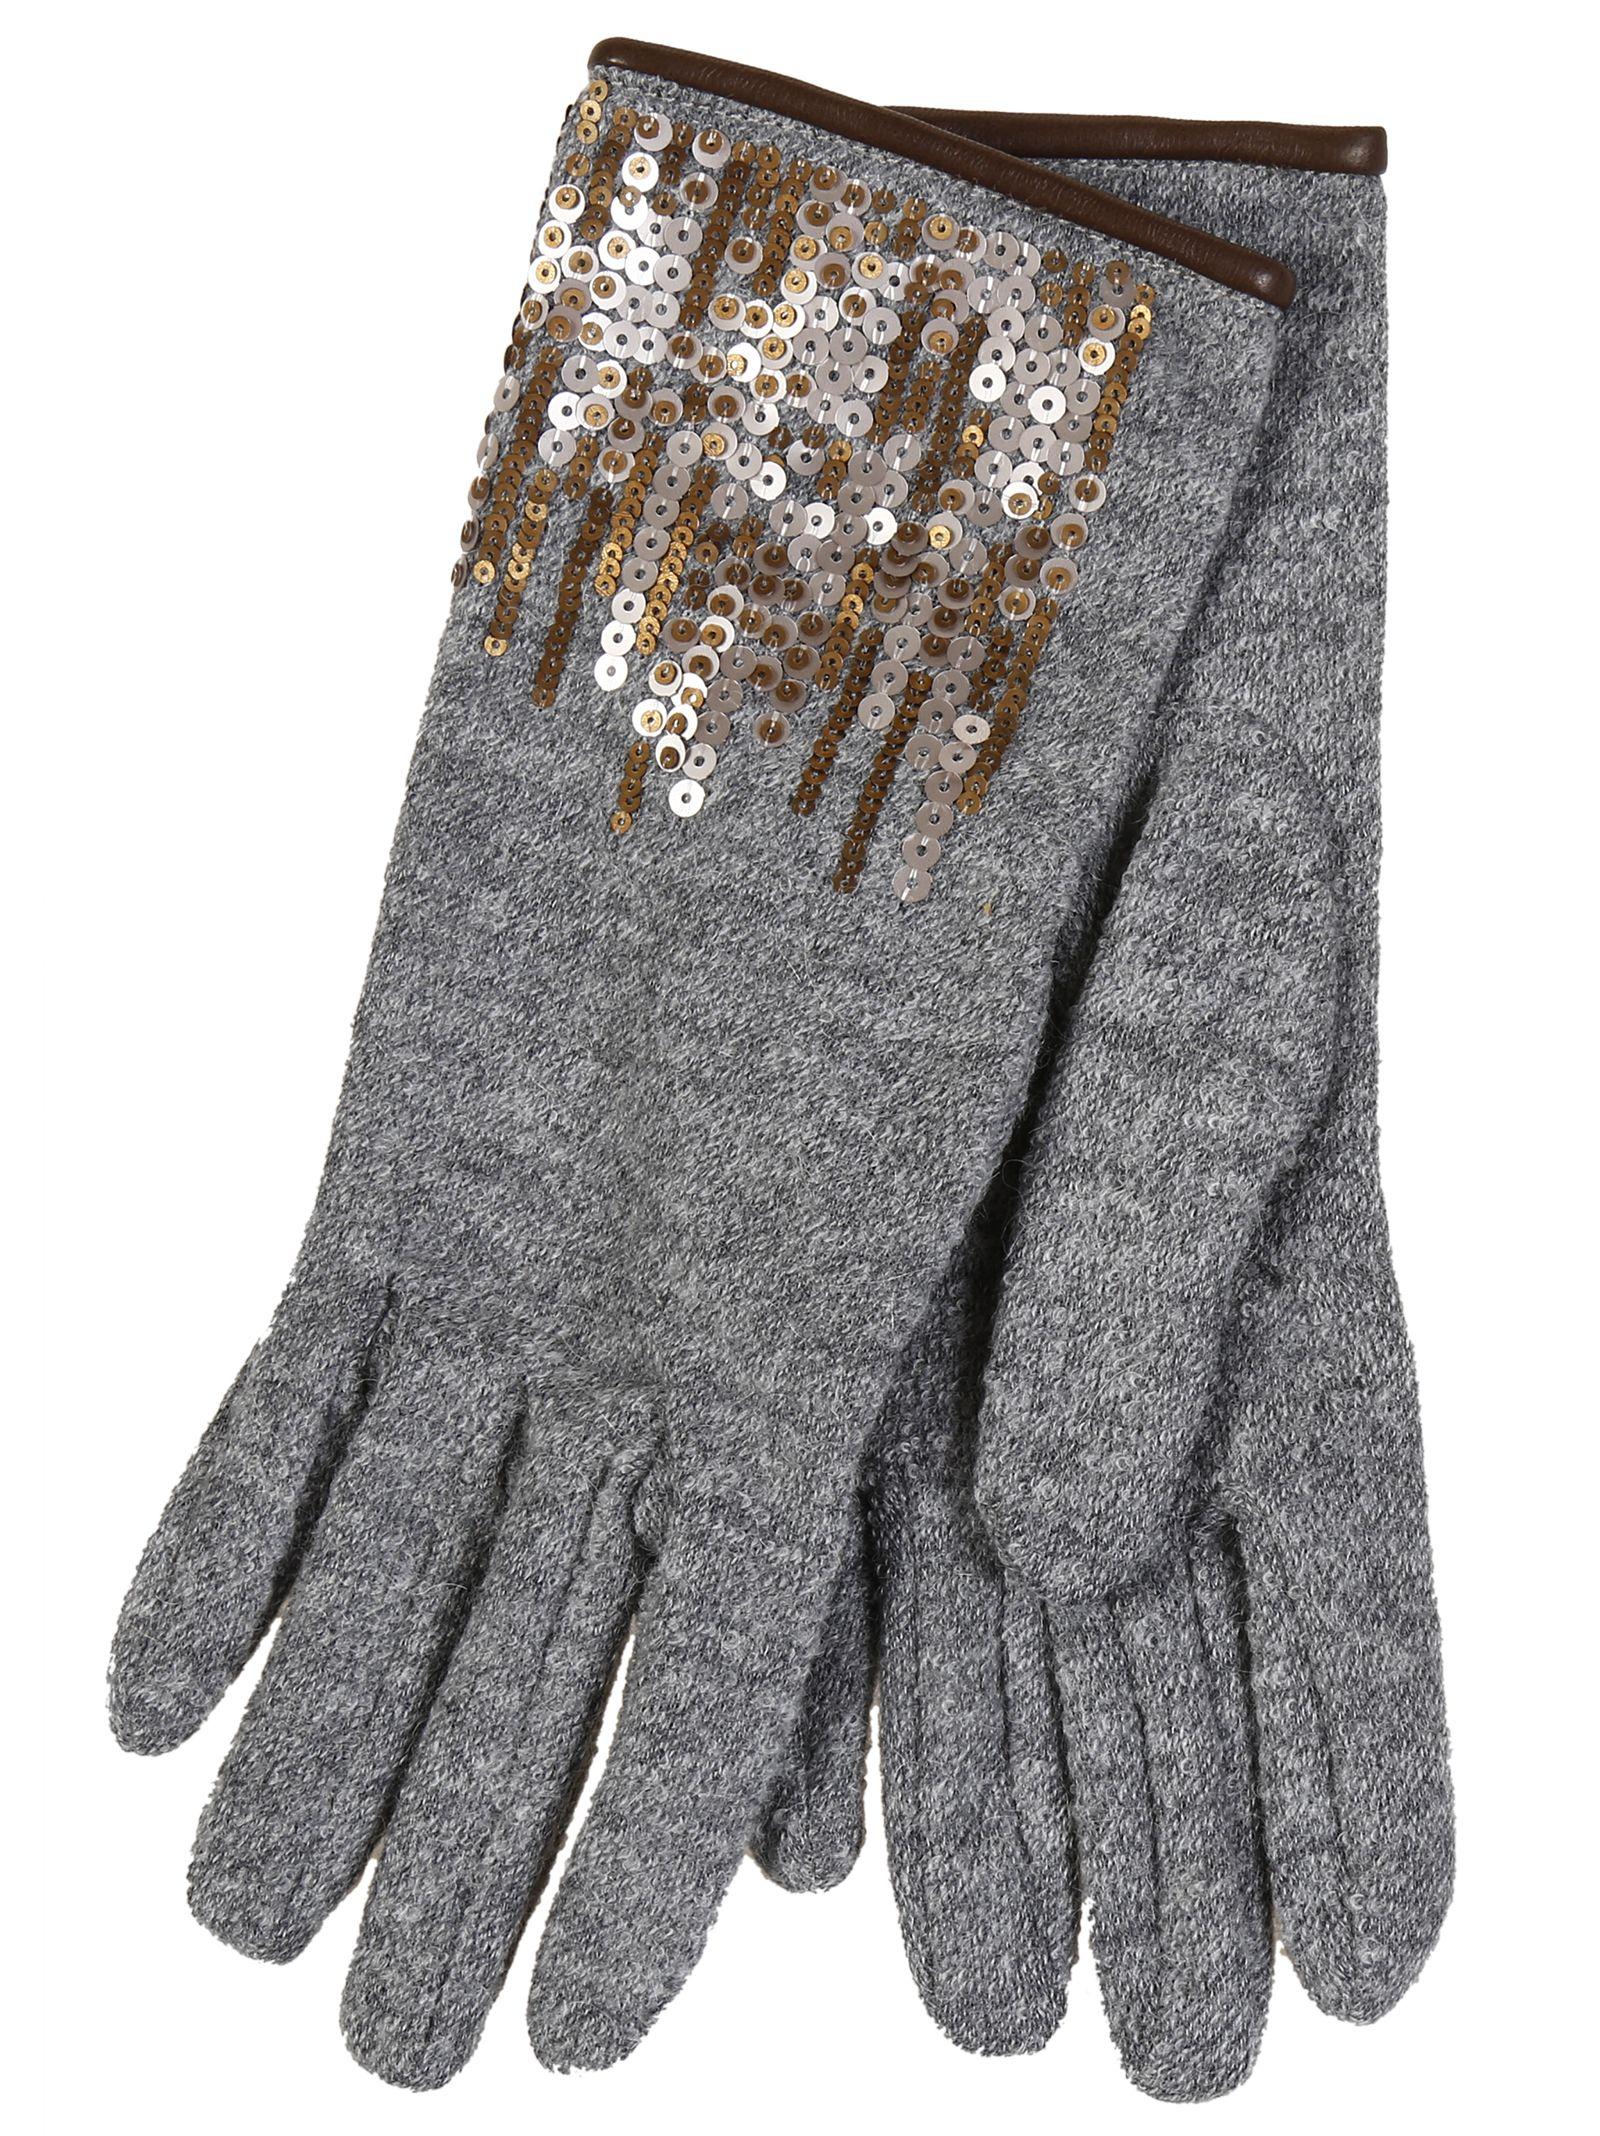 Restelli Alpaca Gloves With Paiettes